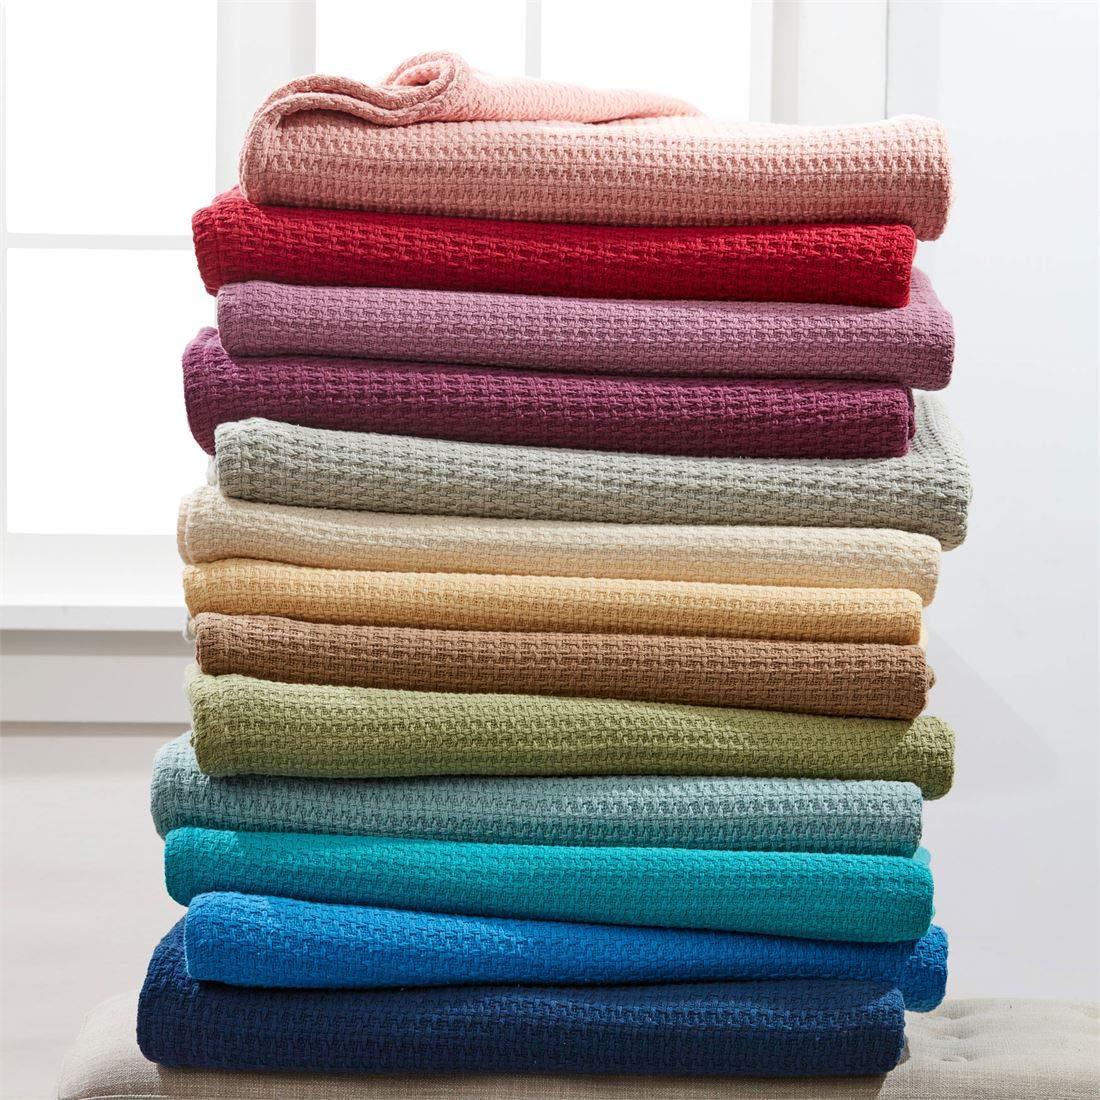 BrylaneHome Studio Primrose Cotton Blanket (Spa,Full/Queen)